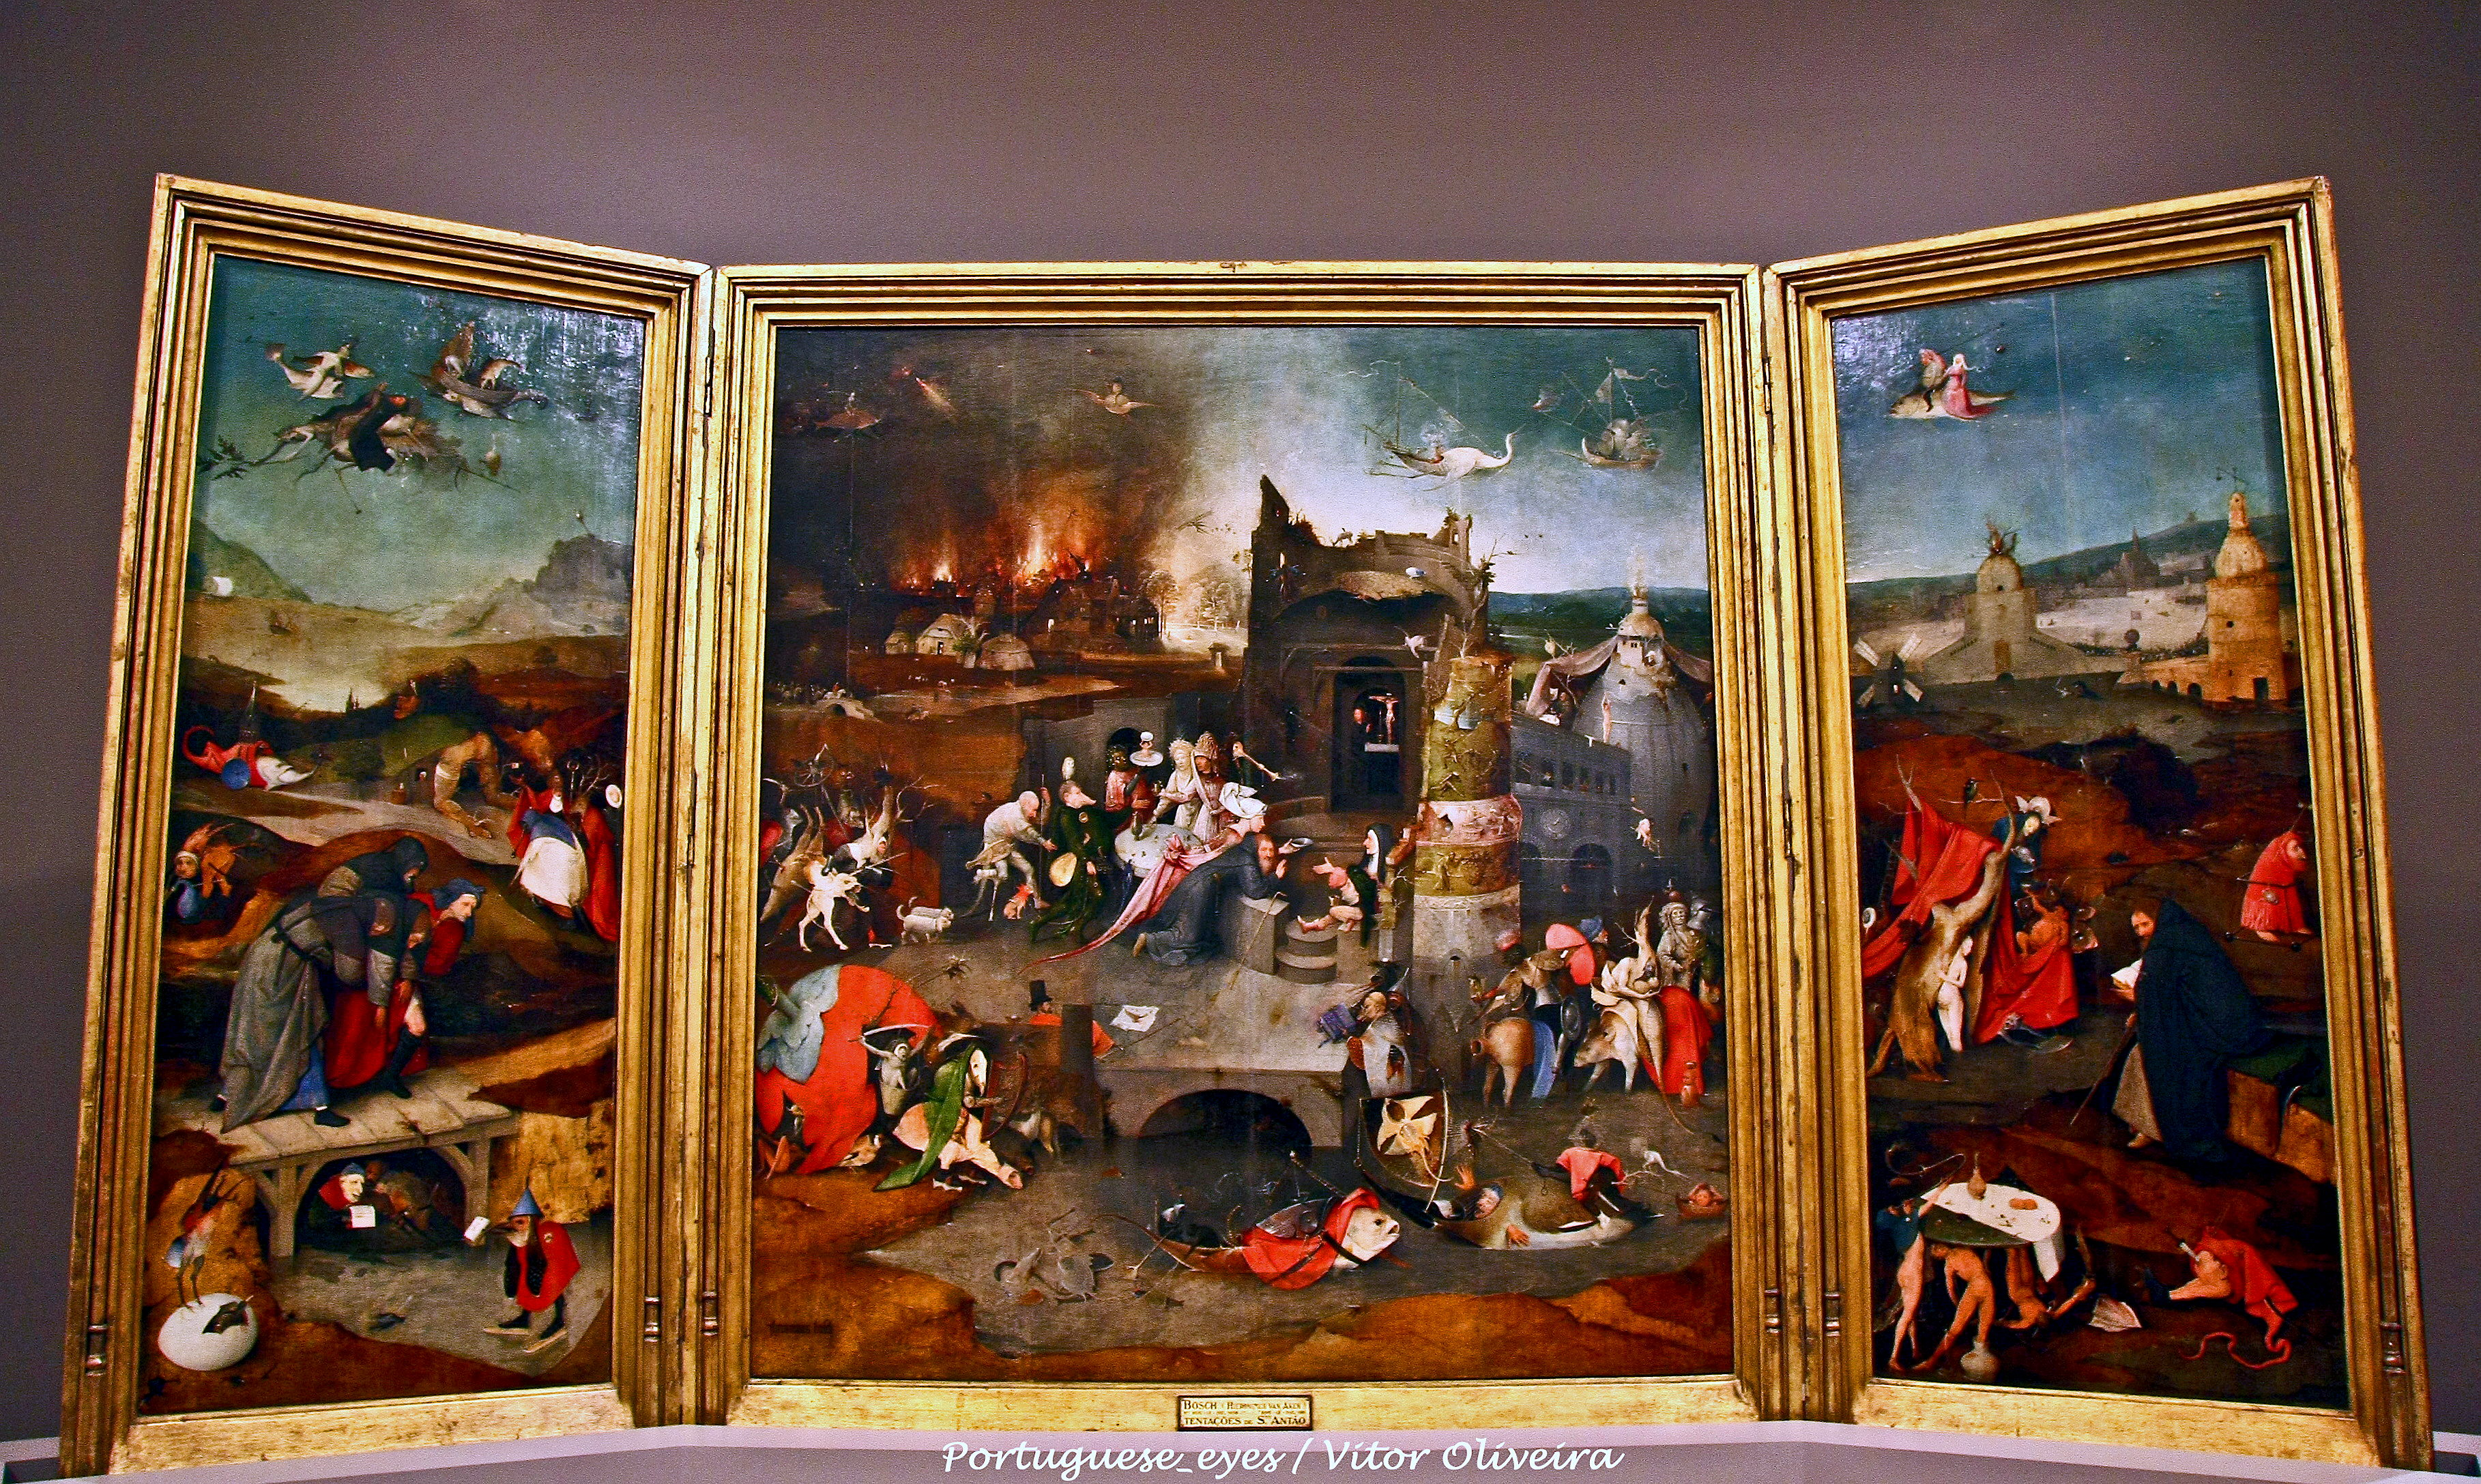 File:Museu Nacional de Arte Antiga - Lisboa - Portugal (30925270232).jpg -  Wikimedia Commons